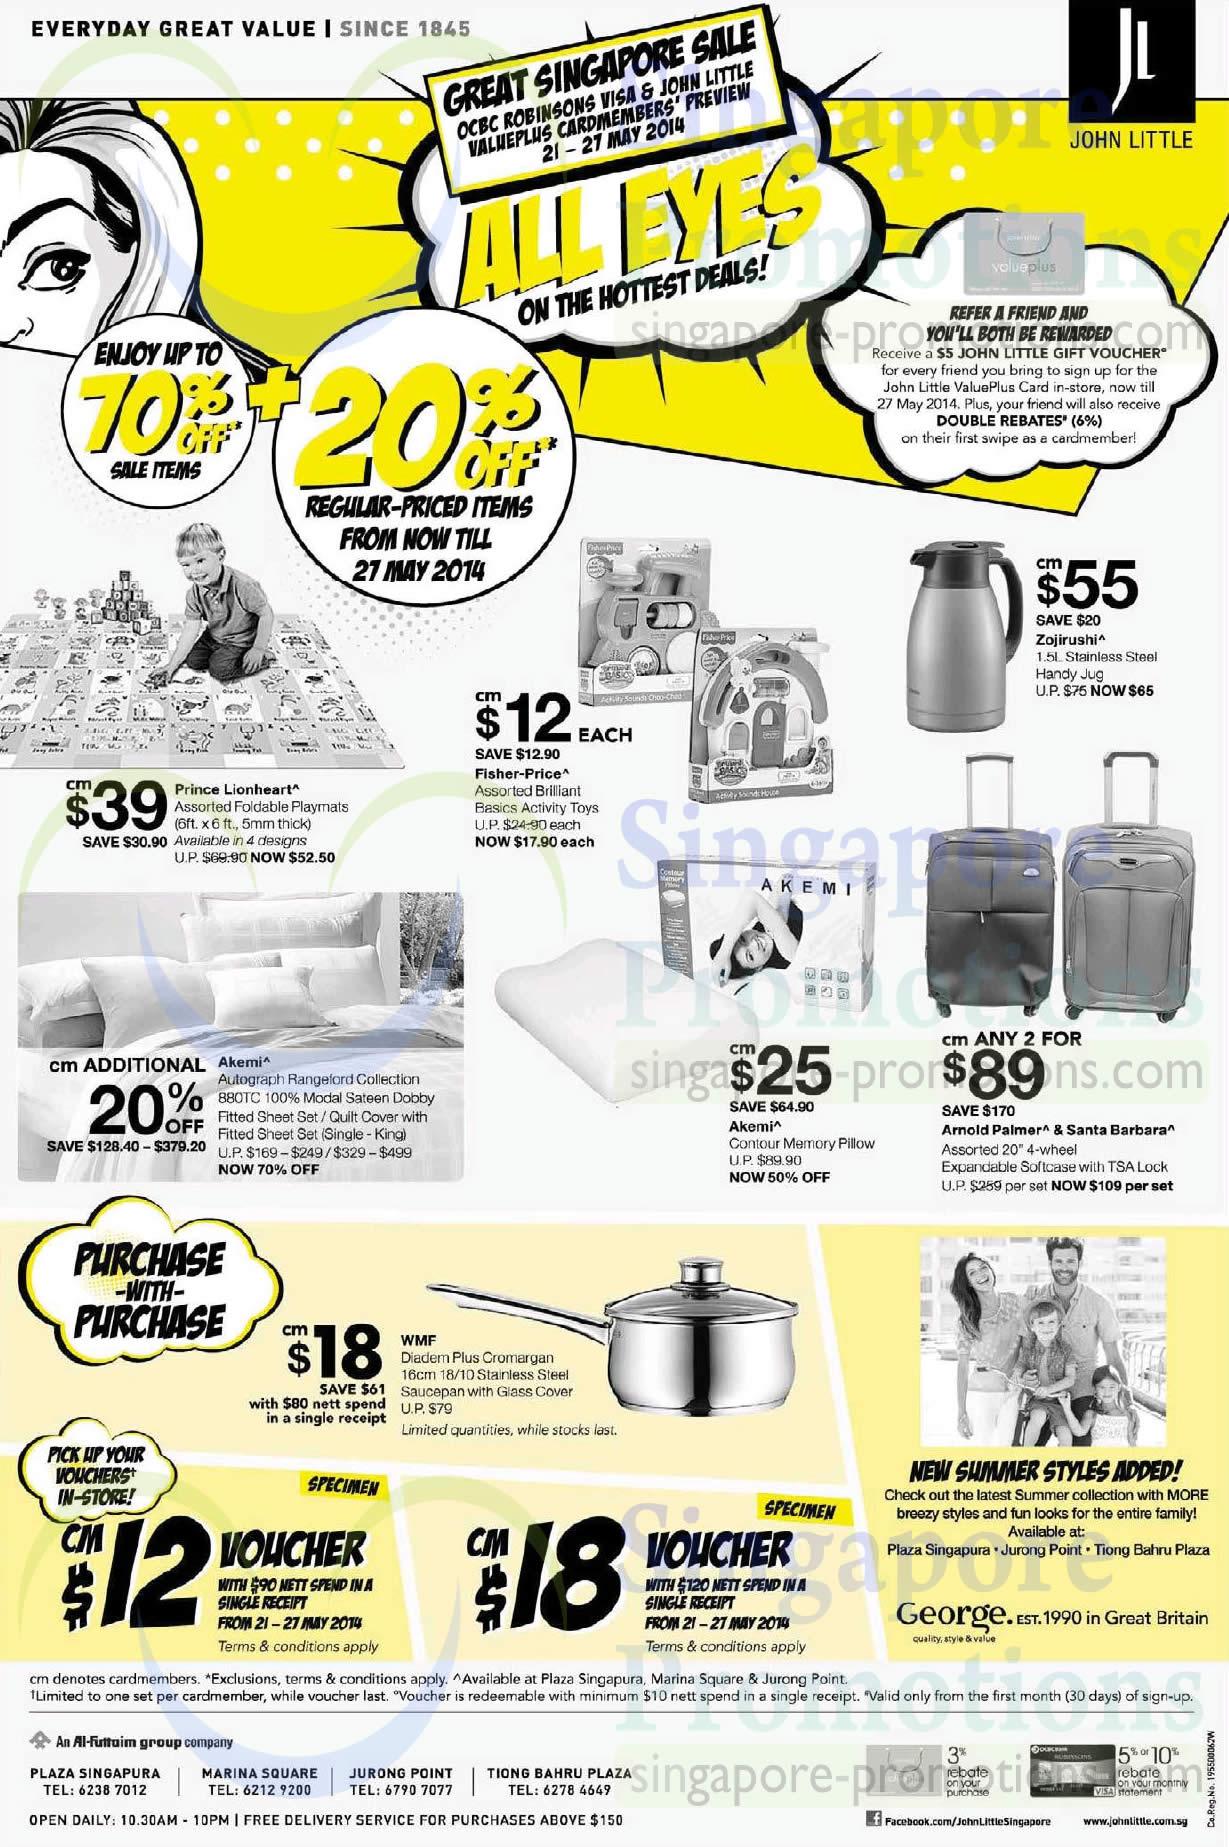 21 May Luggage, Bedsheets, Playmats, Jug, Vouchers, Akemi, Arnold Palmer, Santa Barbaram Zojirushi